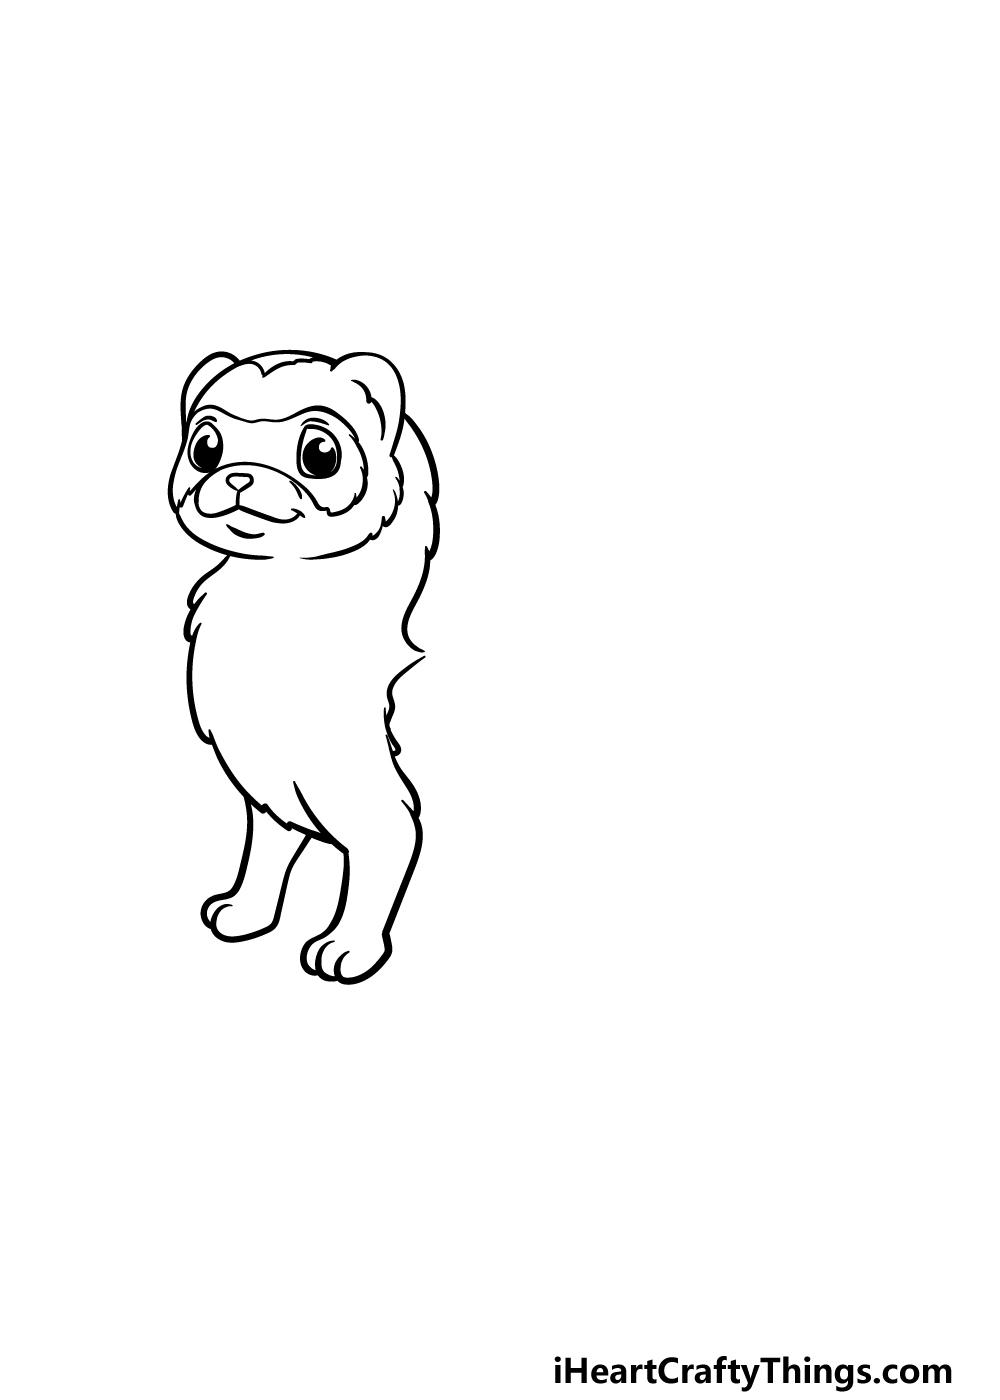 drawing a ferret step 2